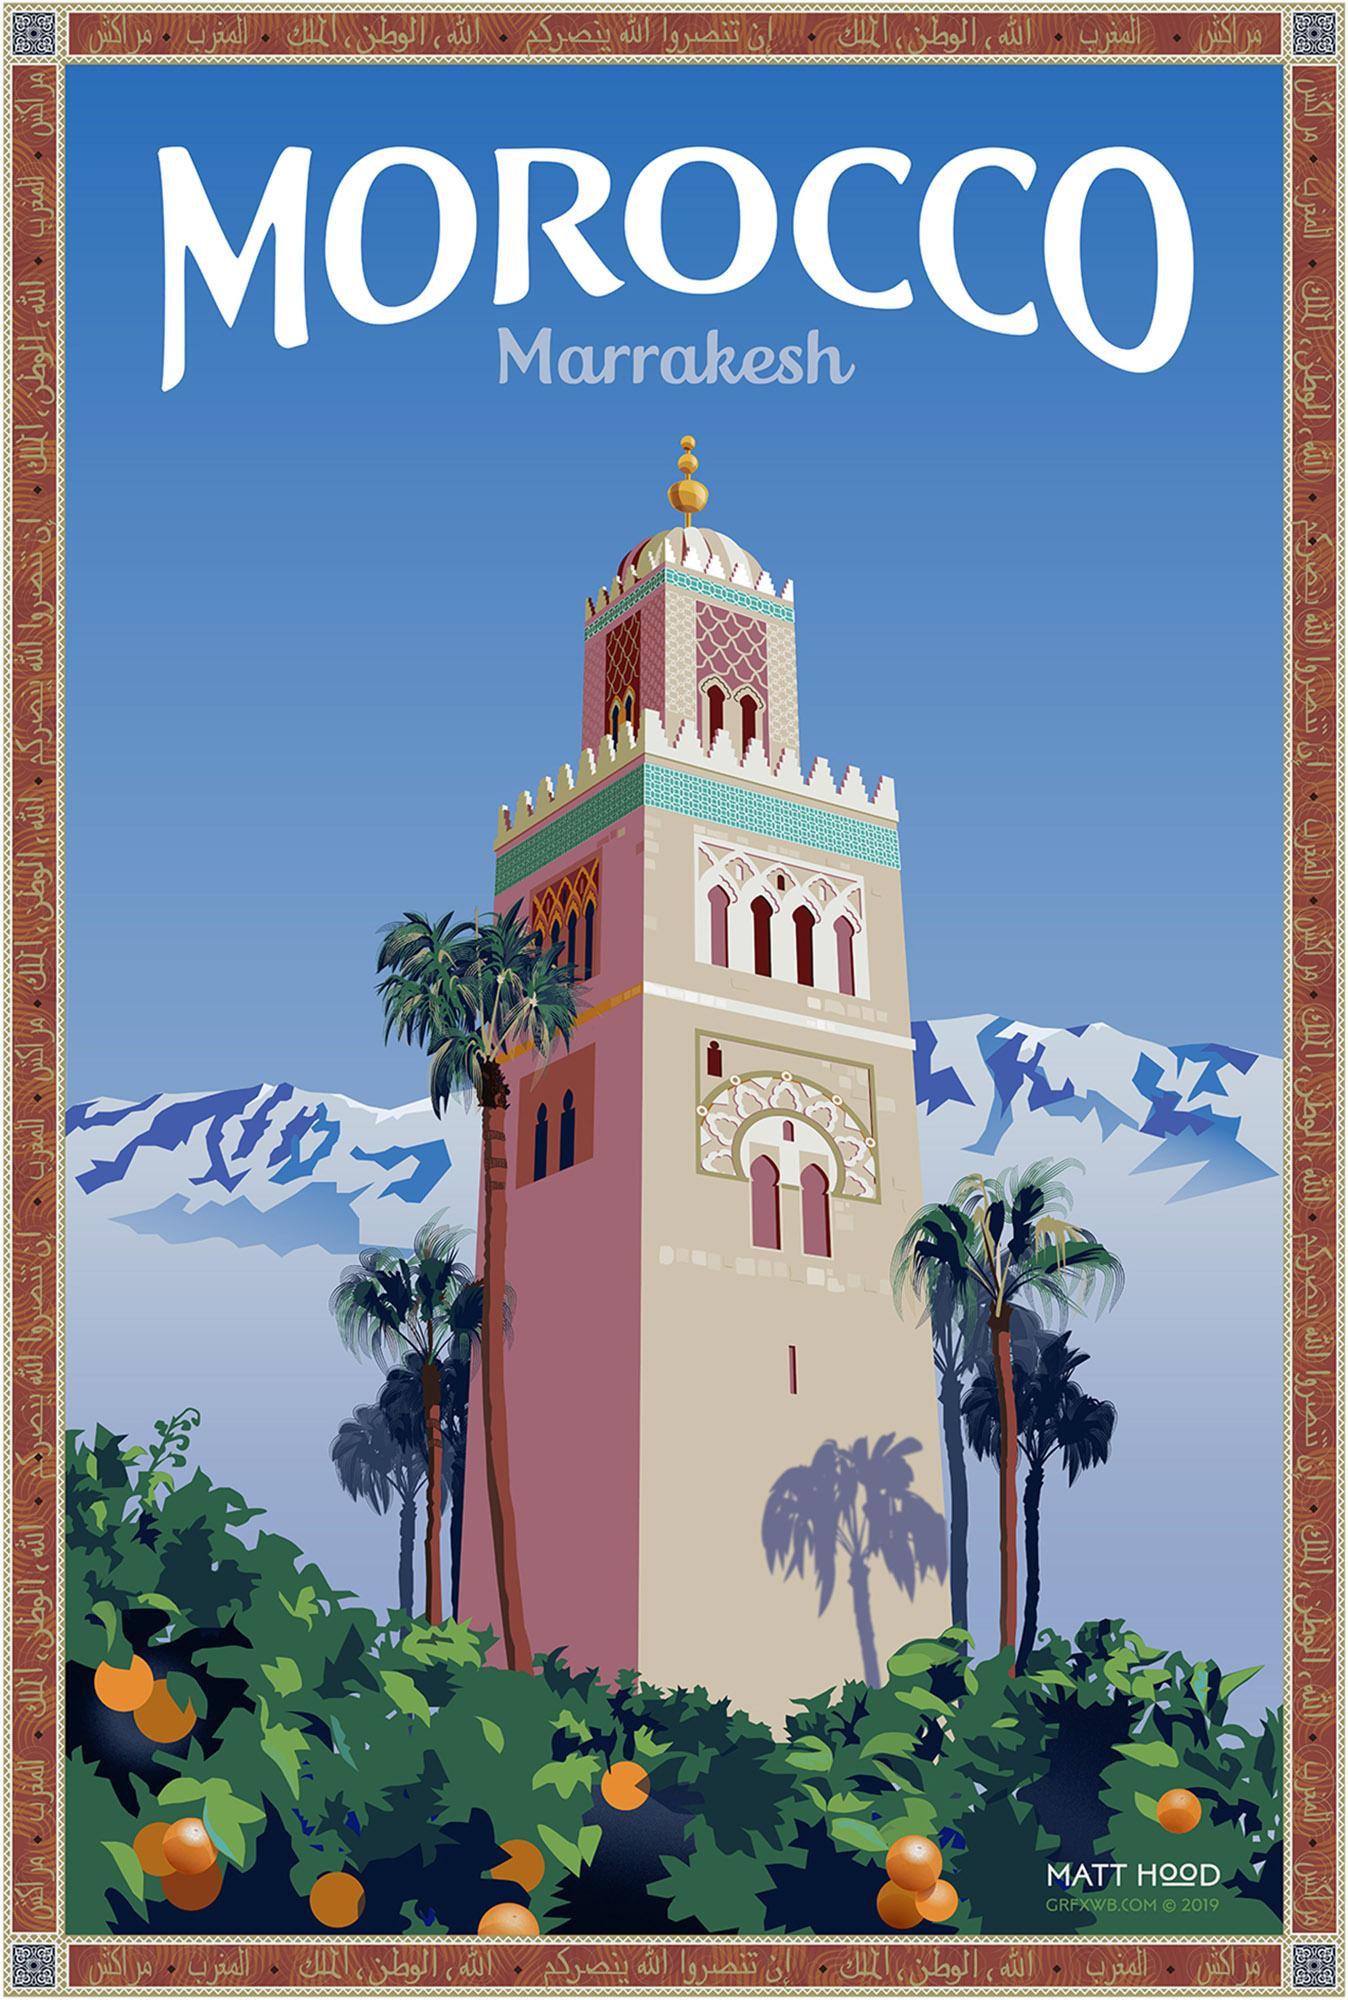 https://grfxwb.com/wp-content/uploads/2021/01/Morocco-NuPort.jpg